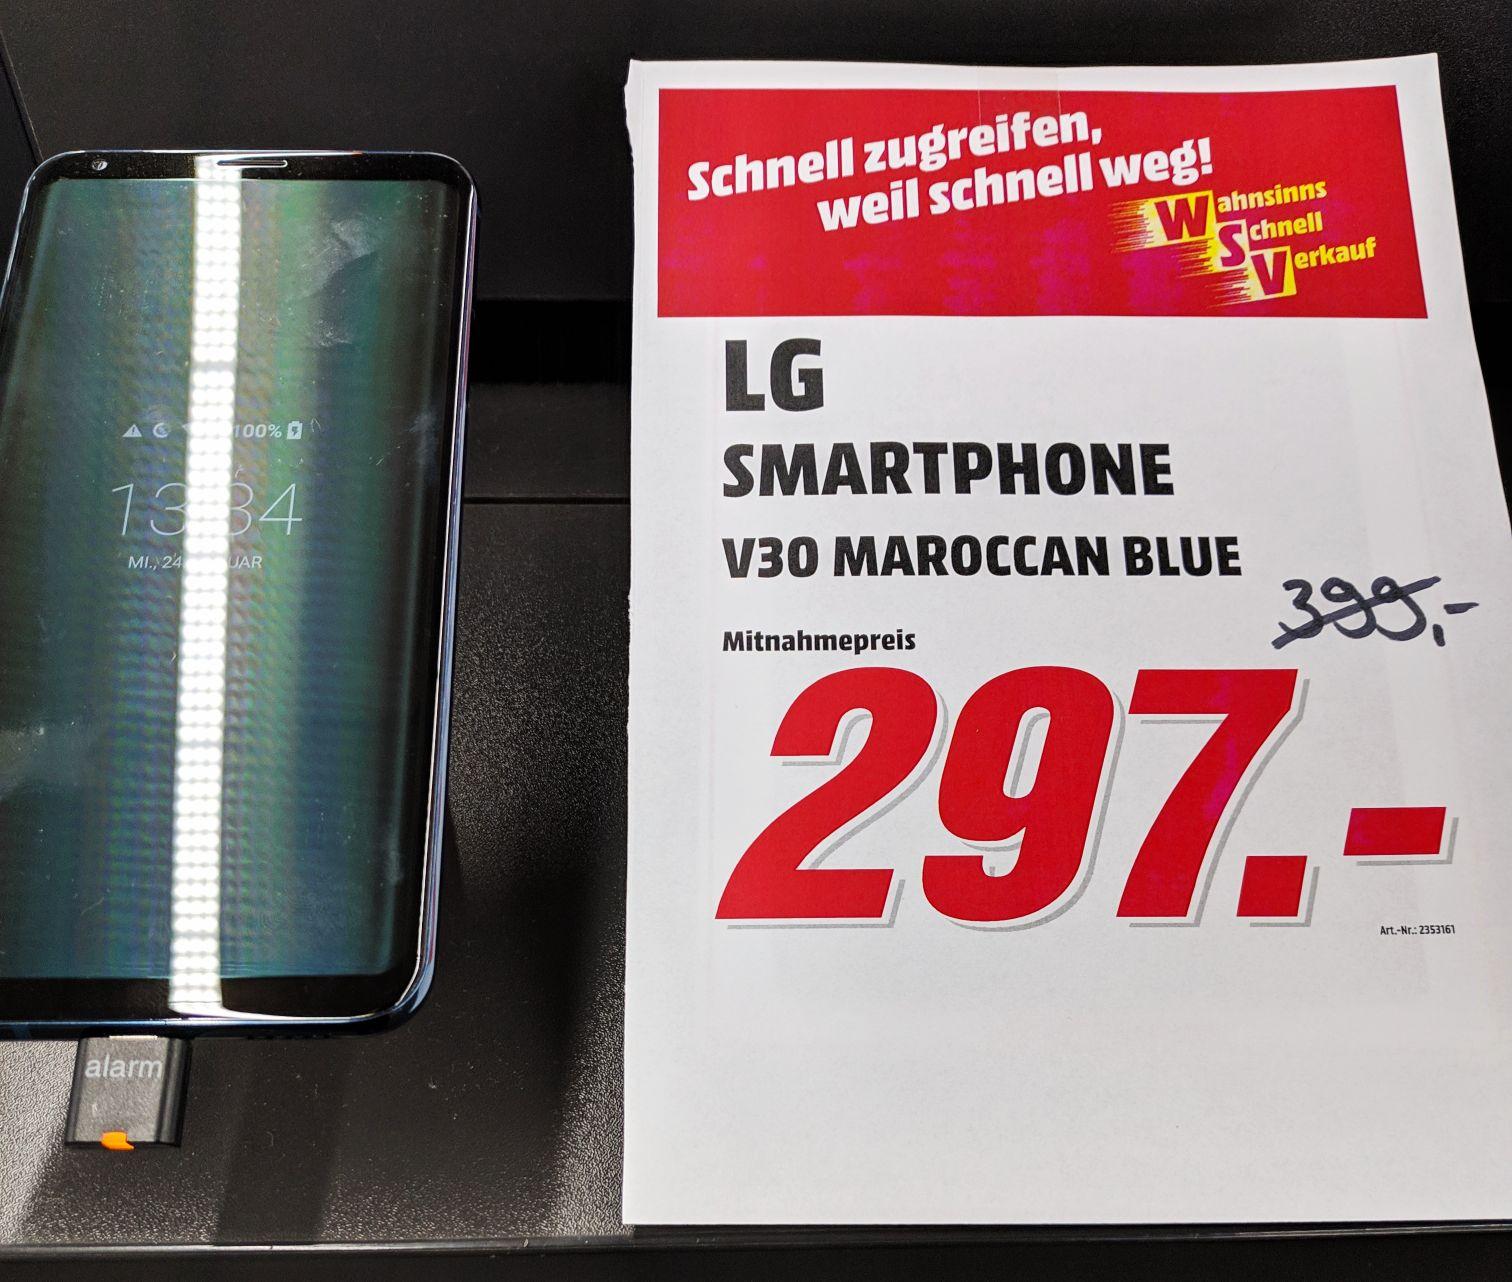 LG V30 in blau, lokal Mediamarkt Köln-Marsdorf nächstbester Preis bei Geizhals.de 379.-€